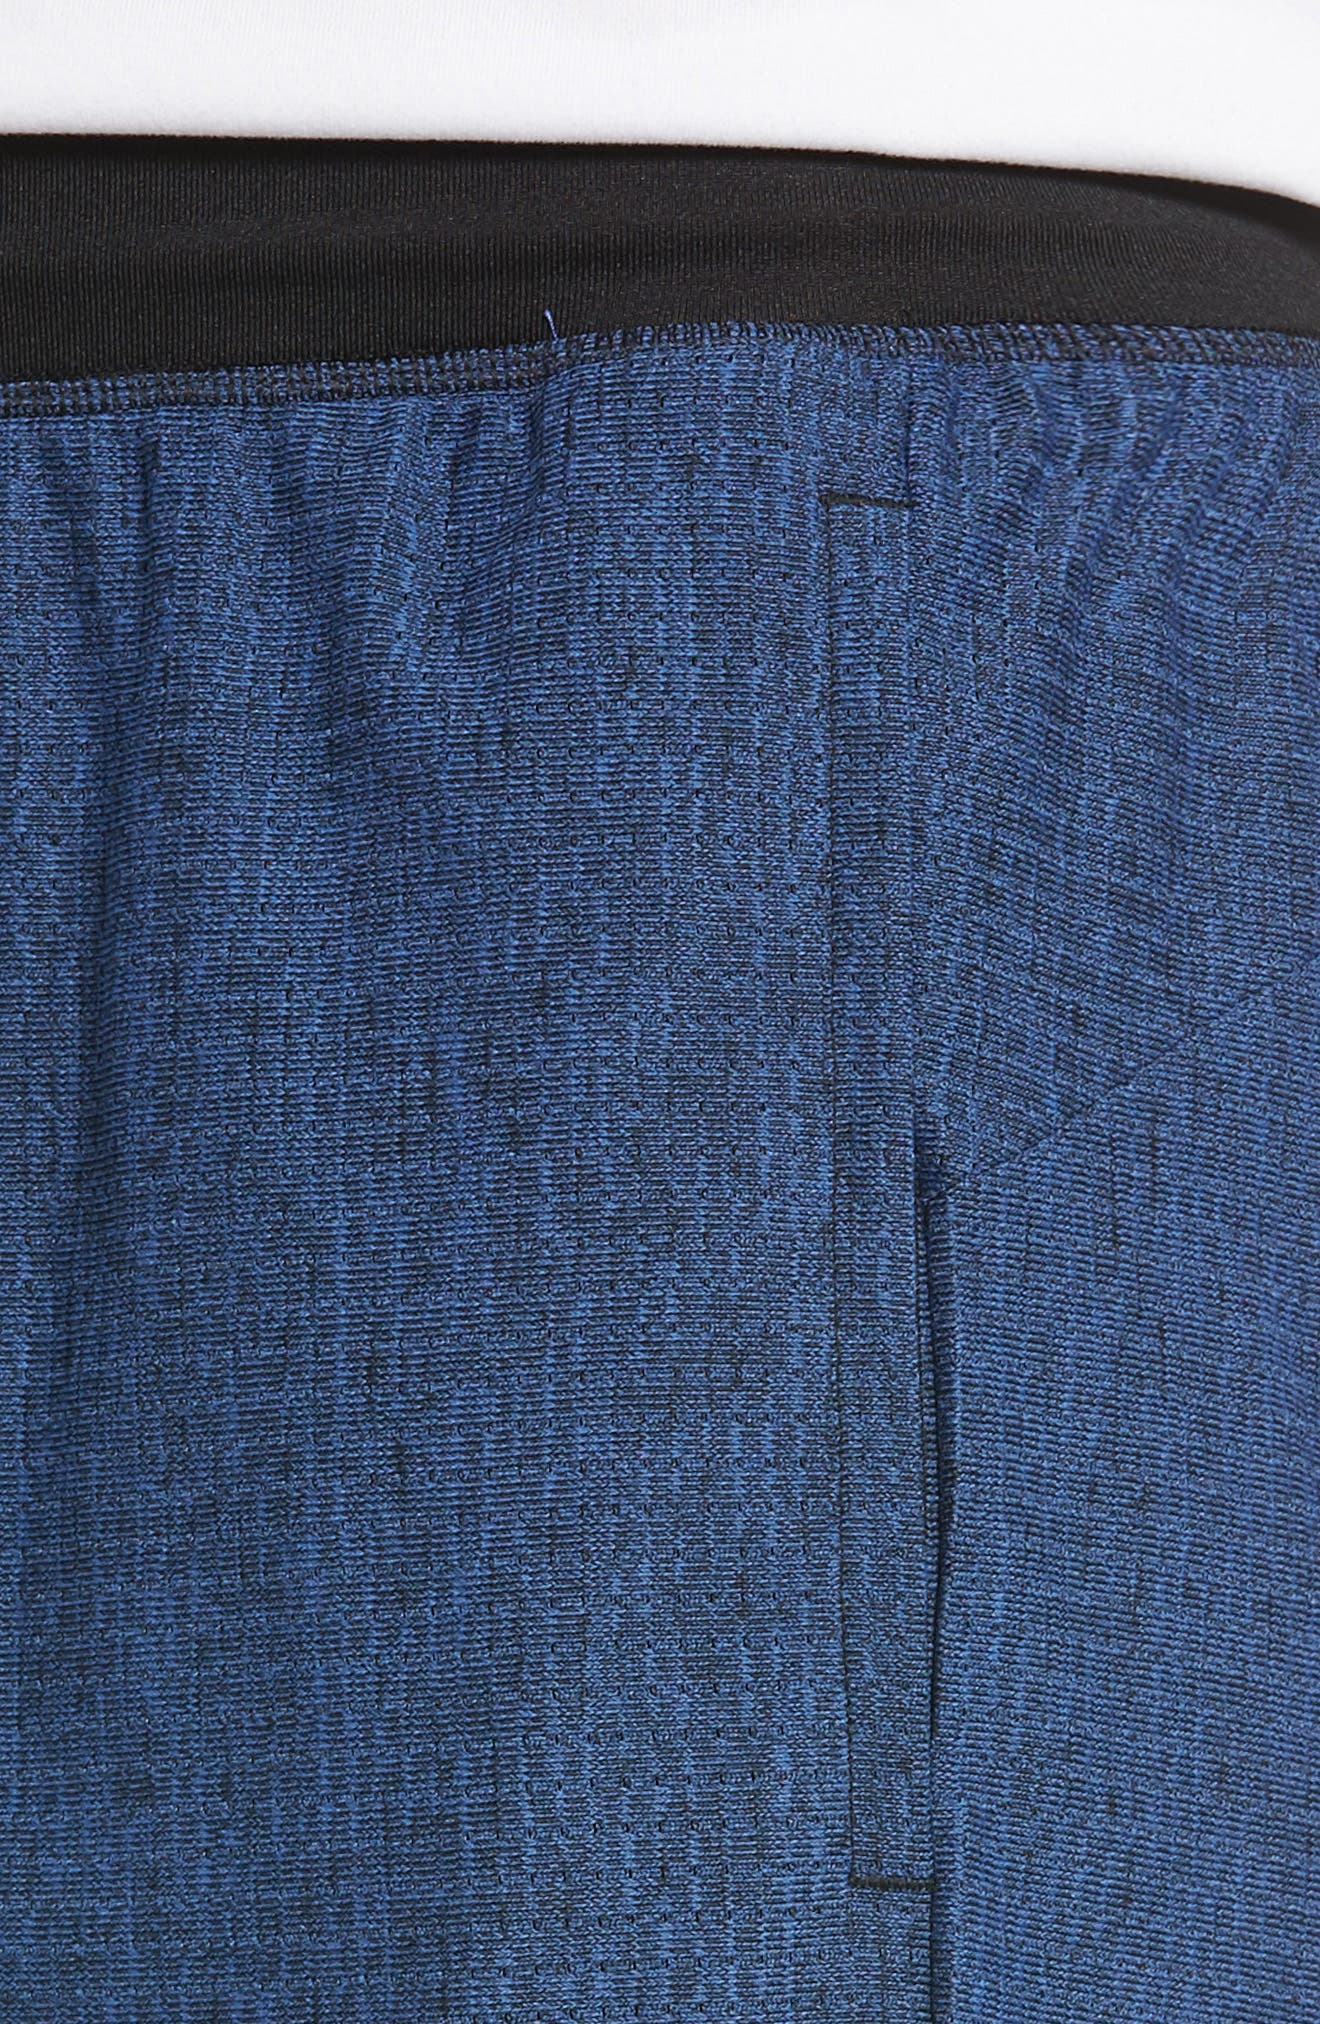 Speedbreaker Shorts,                             Alternate thumbnail 5, color,                             Hi-Res Blue